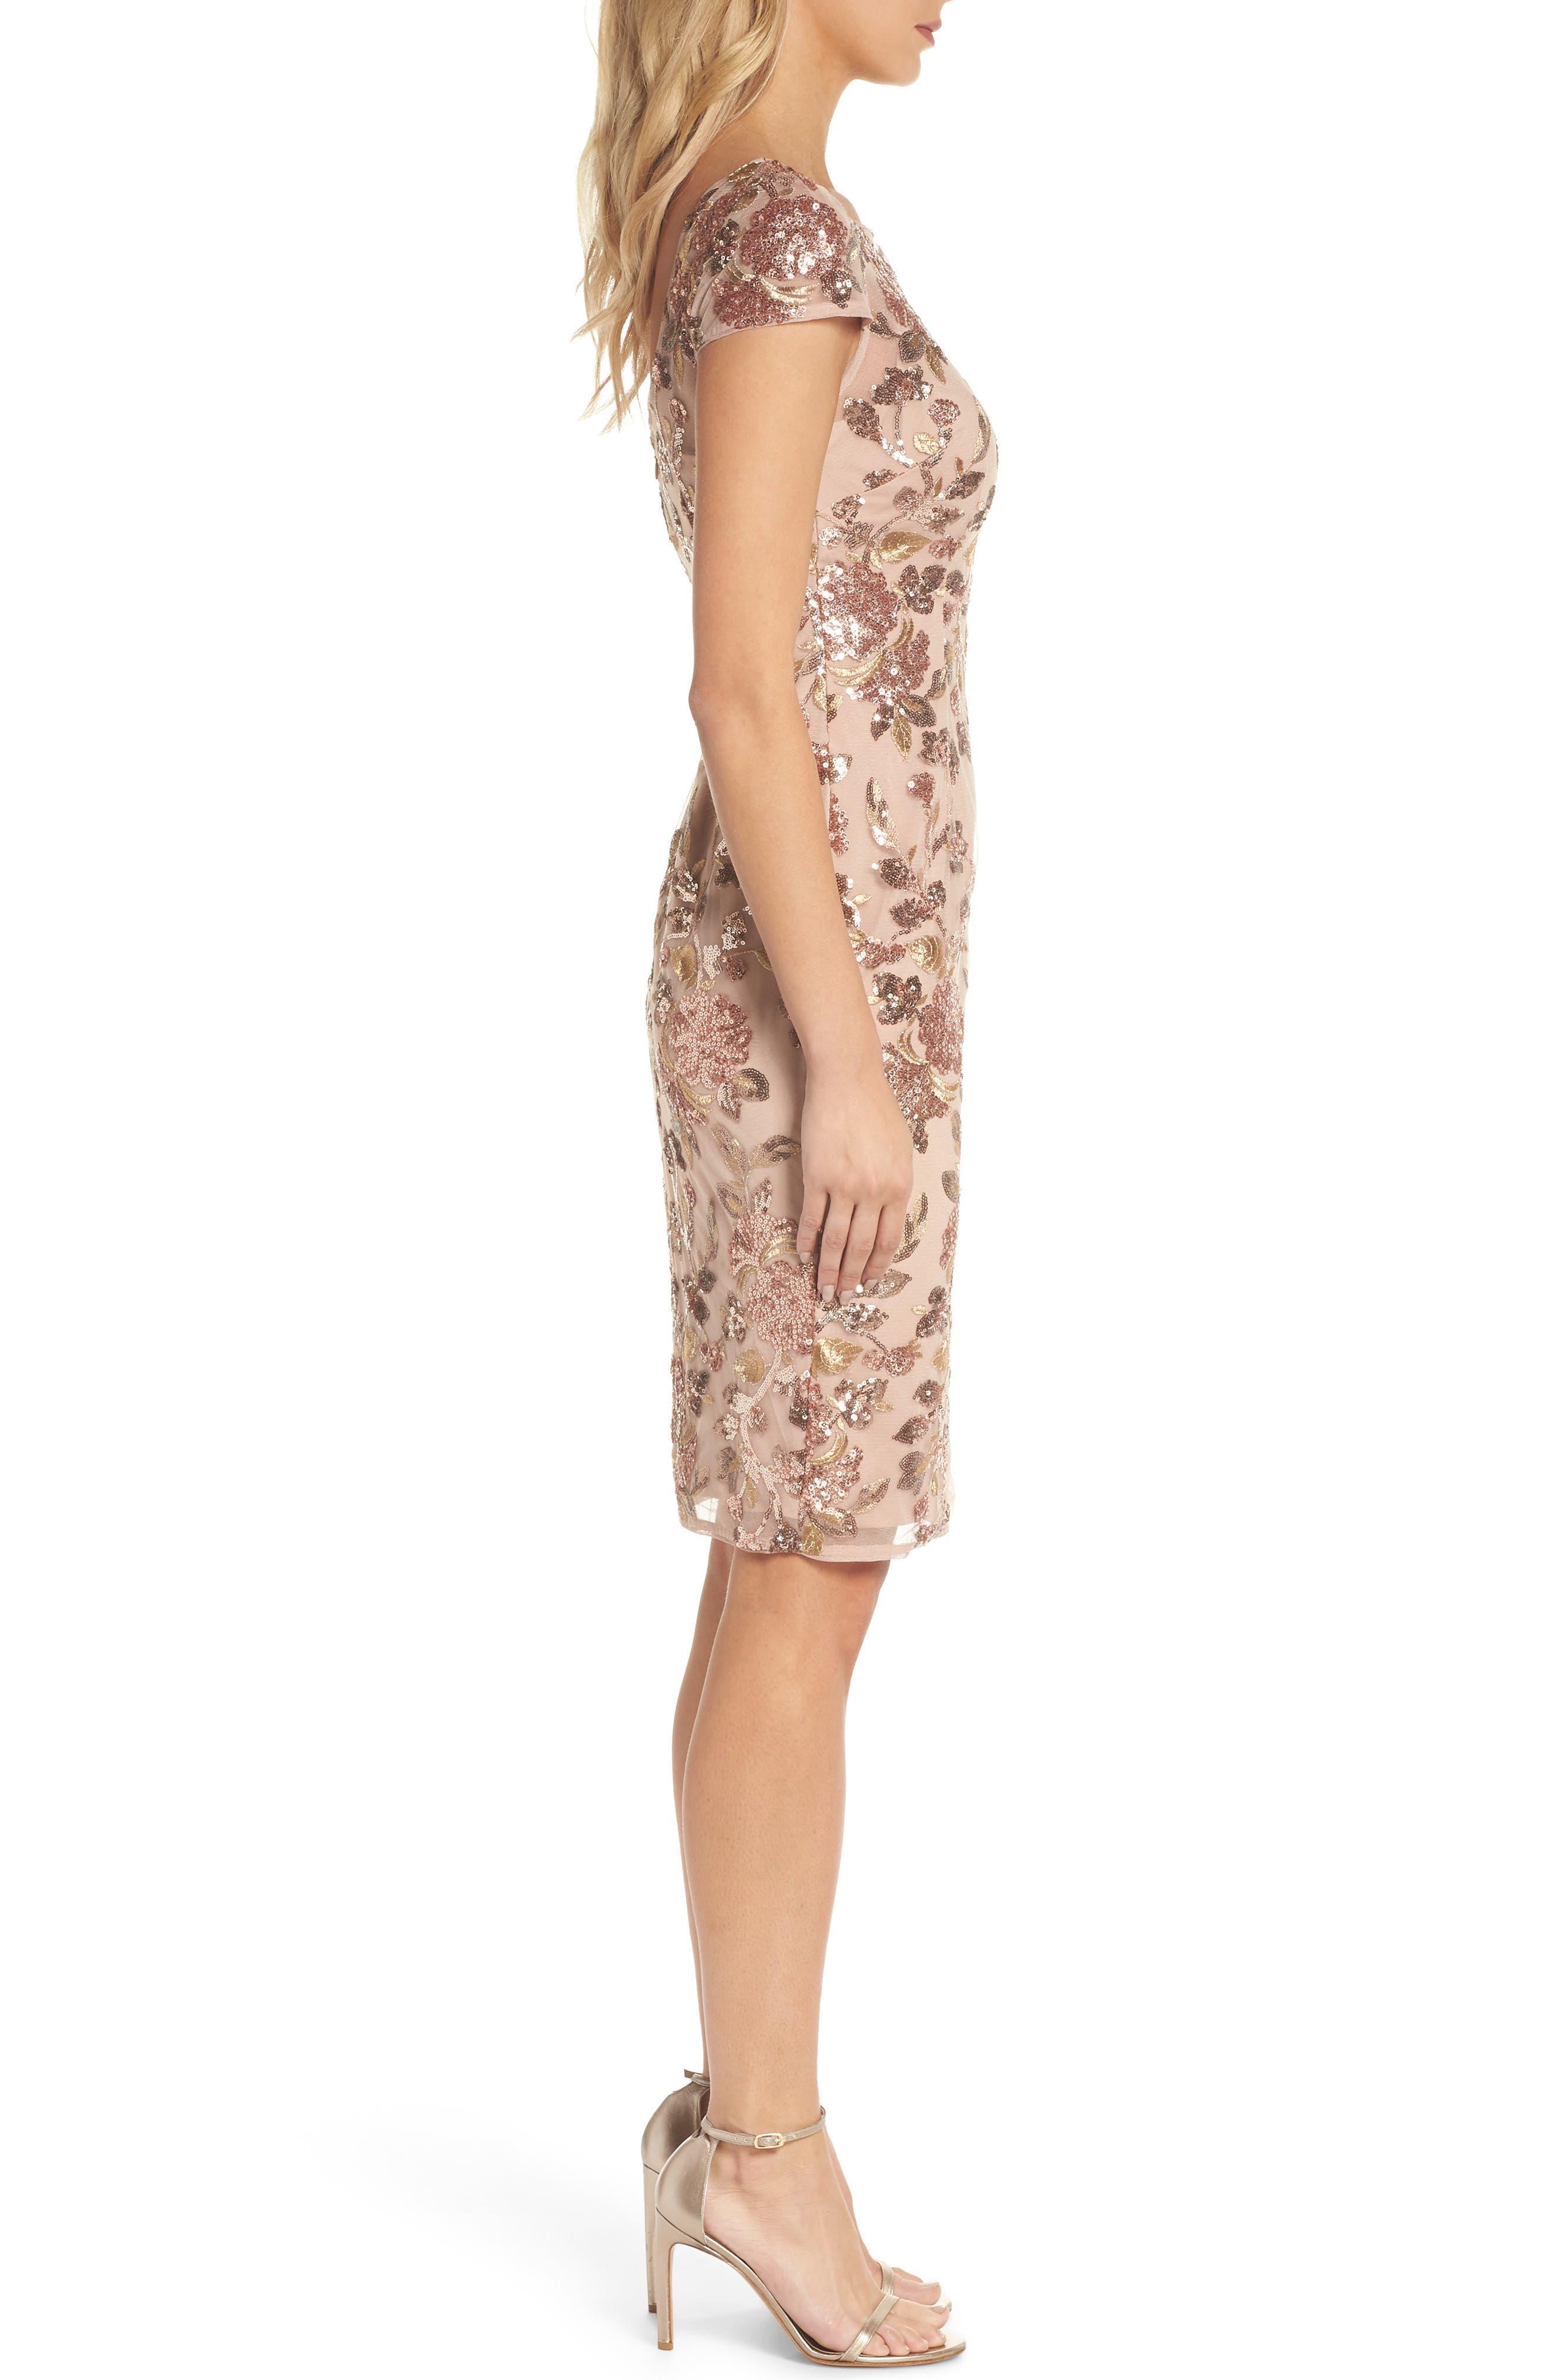 Metallic Floral Sequin Cocktail Dress,                             Alternate thumbnail 3, color,                             220